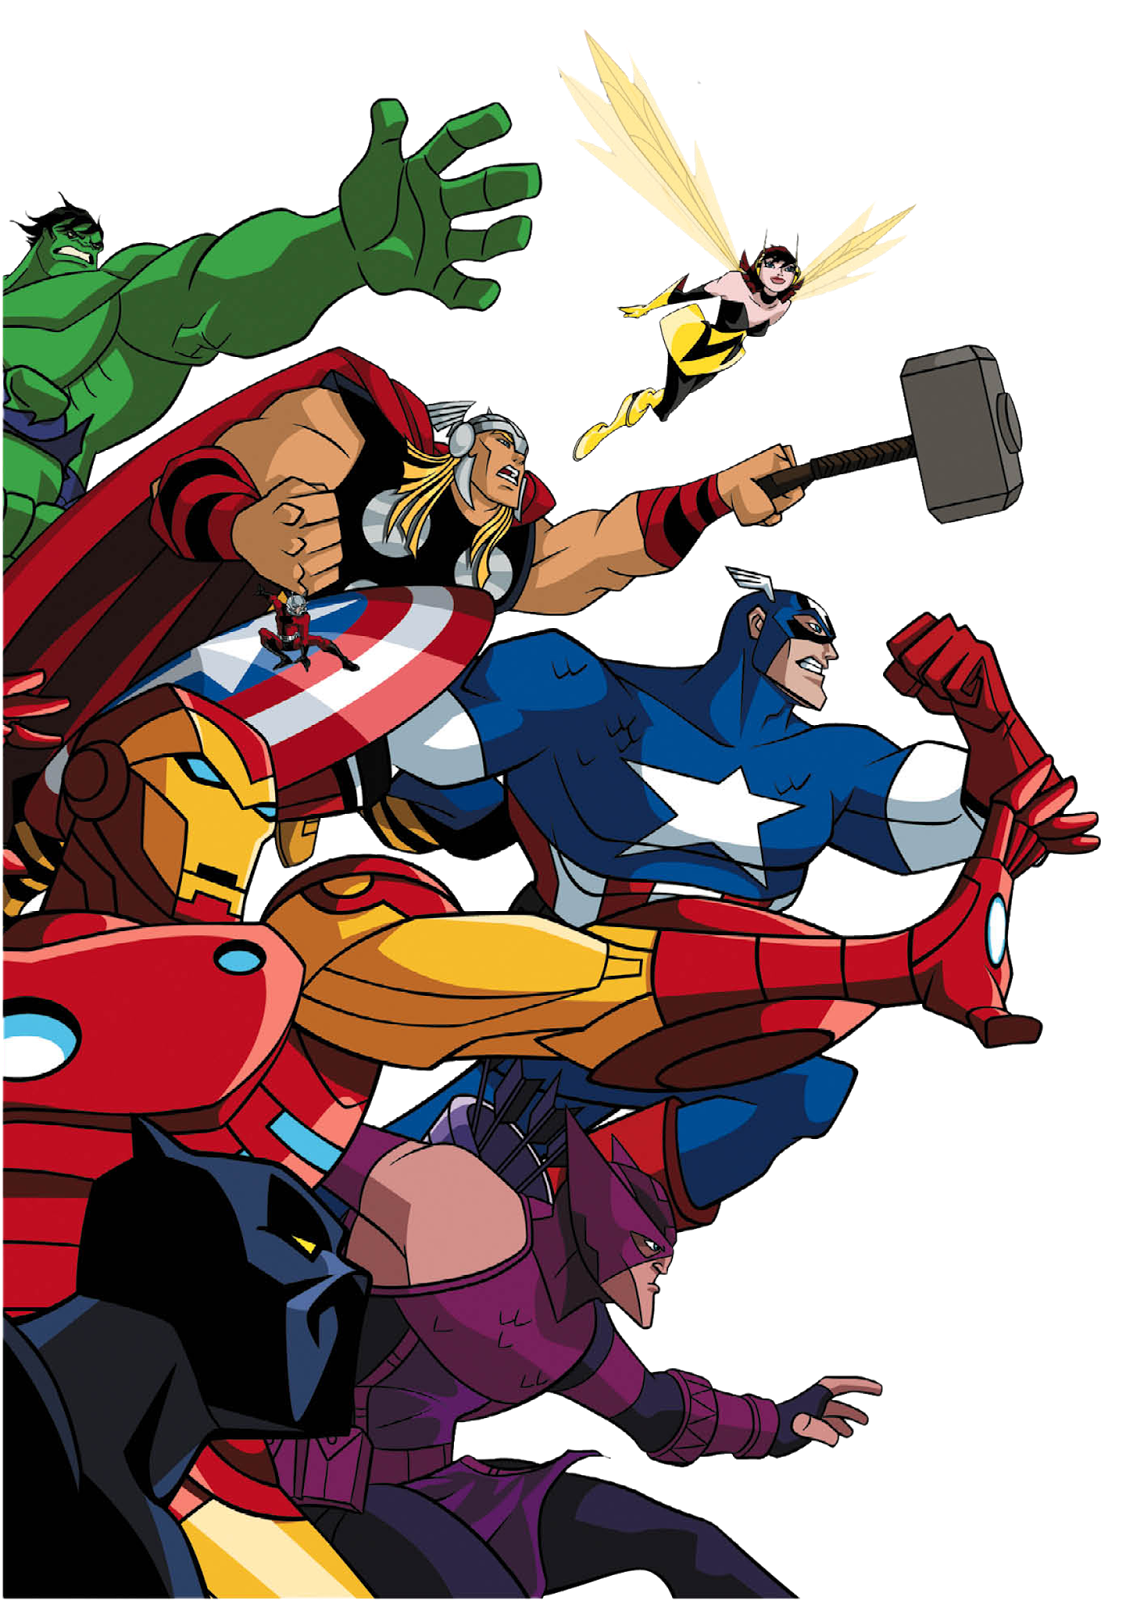 73 Besten Avengers Bilder Auf Pinterest: My Heroe Comic